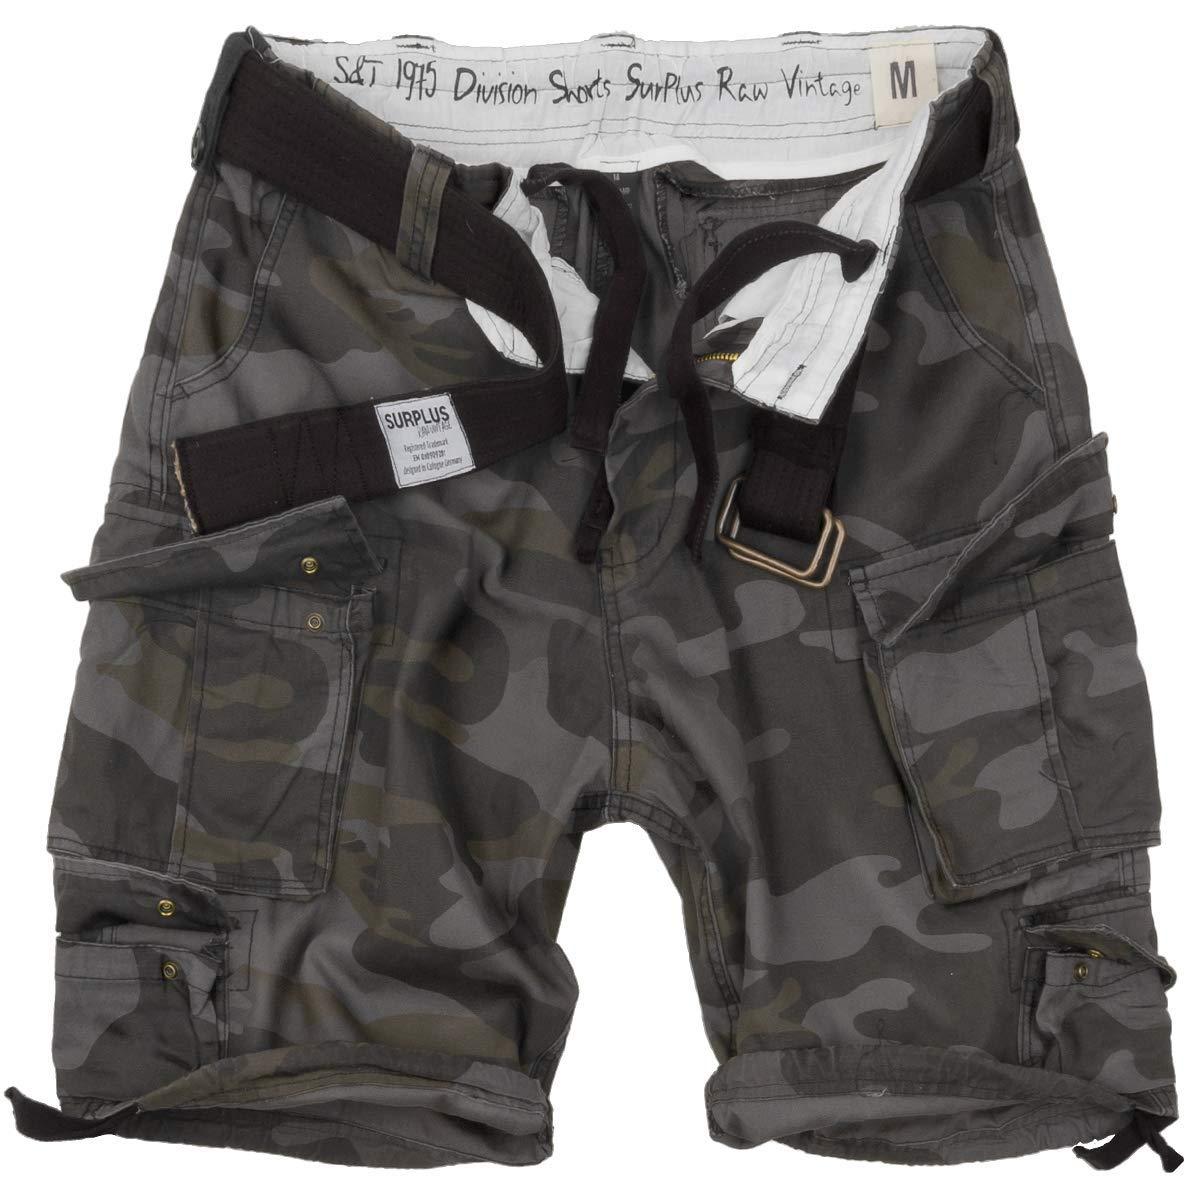 TALLA 5XL. Surplus Division Shorts, Zapatos Elegantes para Hombre